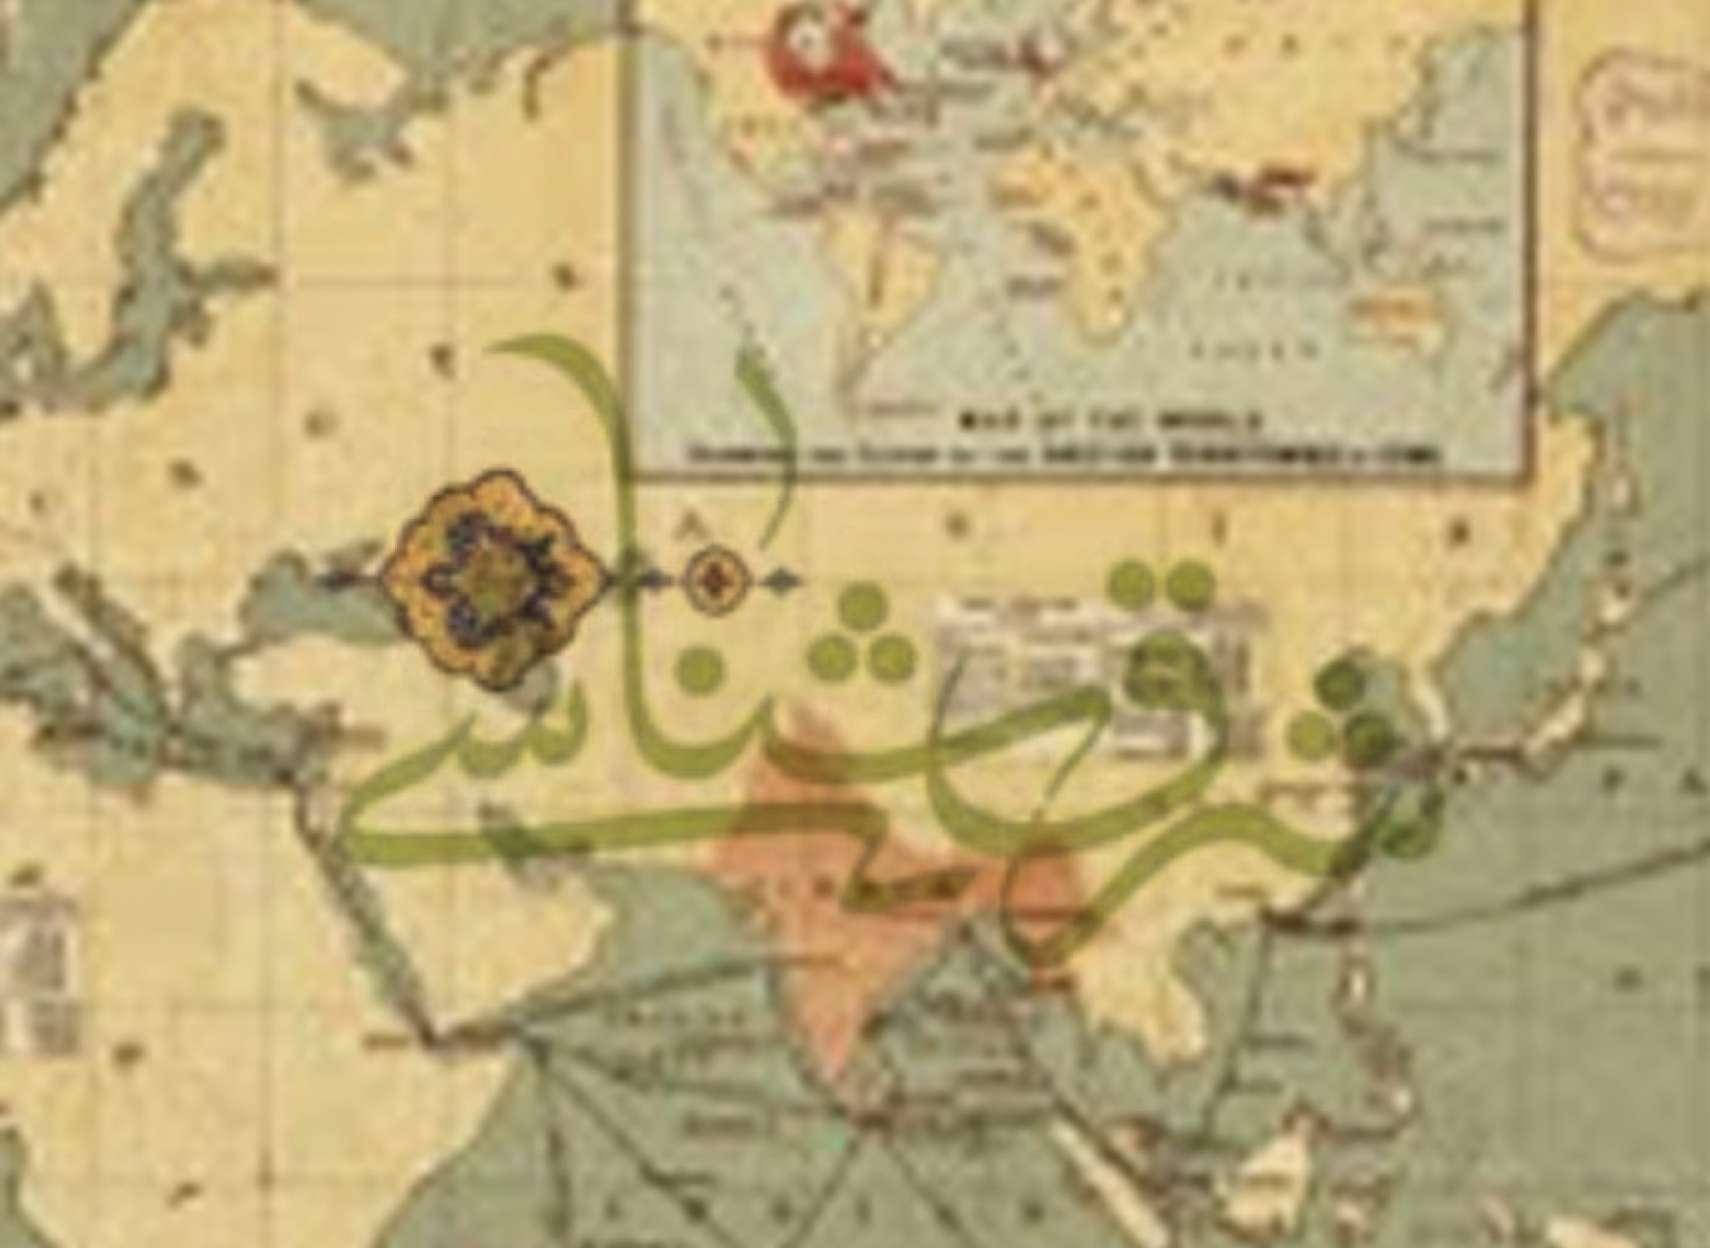 اختری-تاریخ-اوبن-ژان-شرق-شناس-فرانسوی